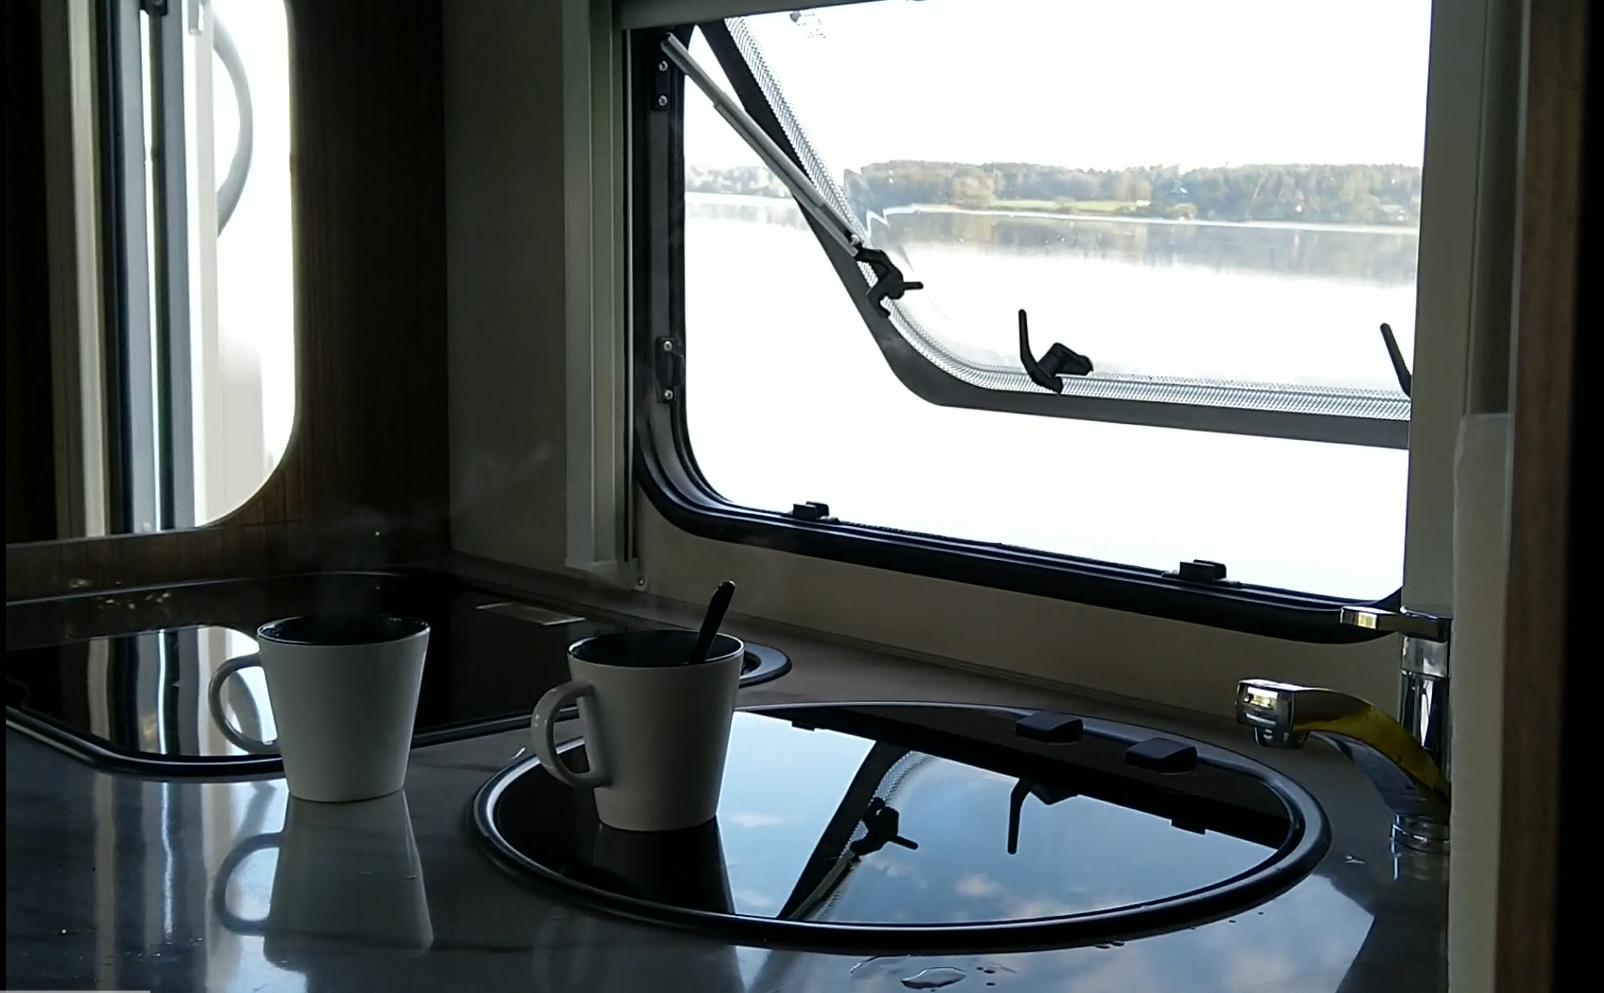 Wohnmobil mit Kaffee